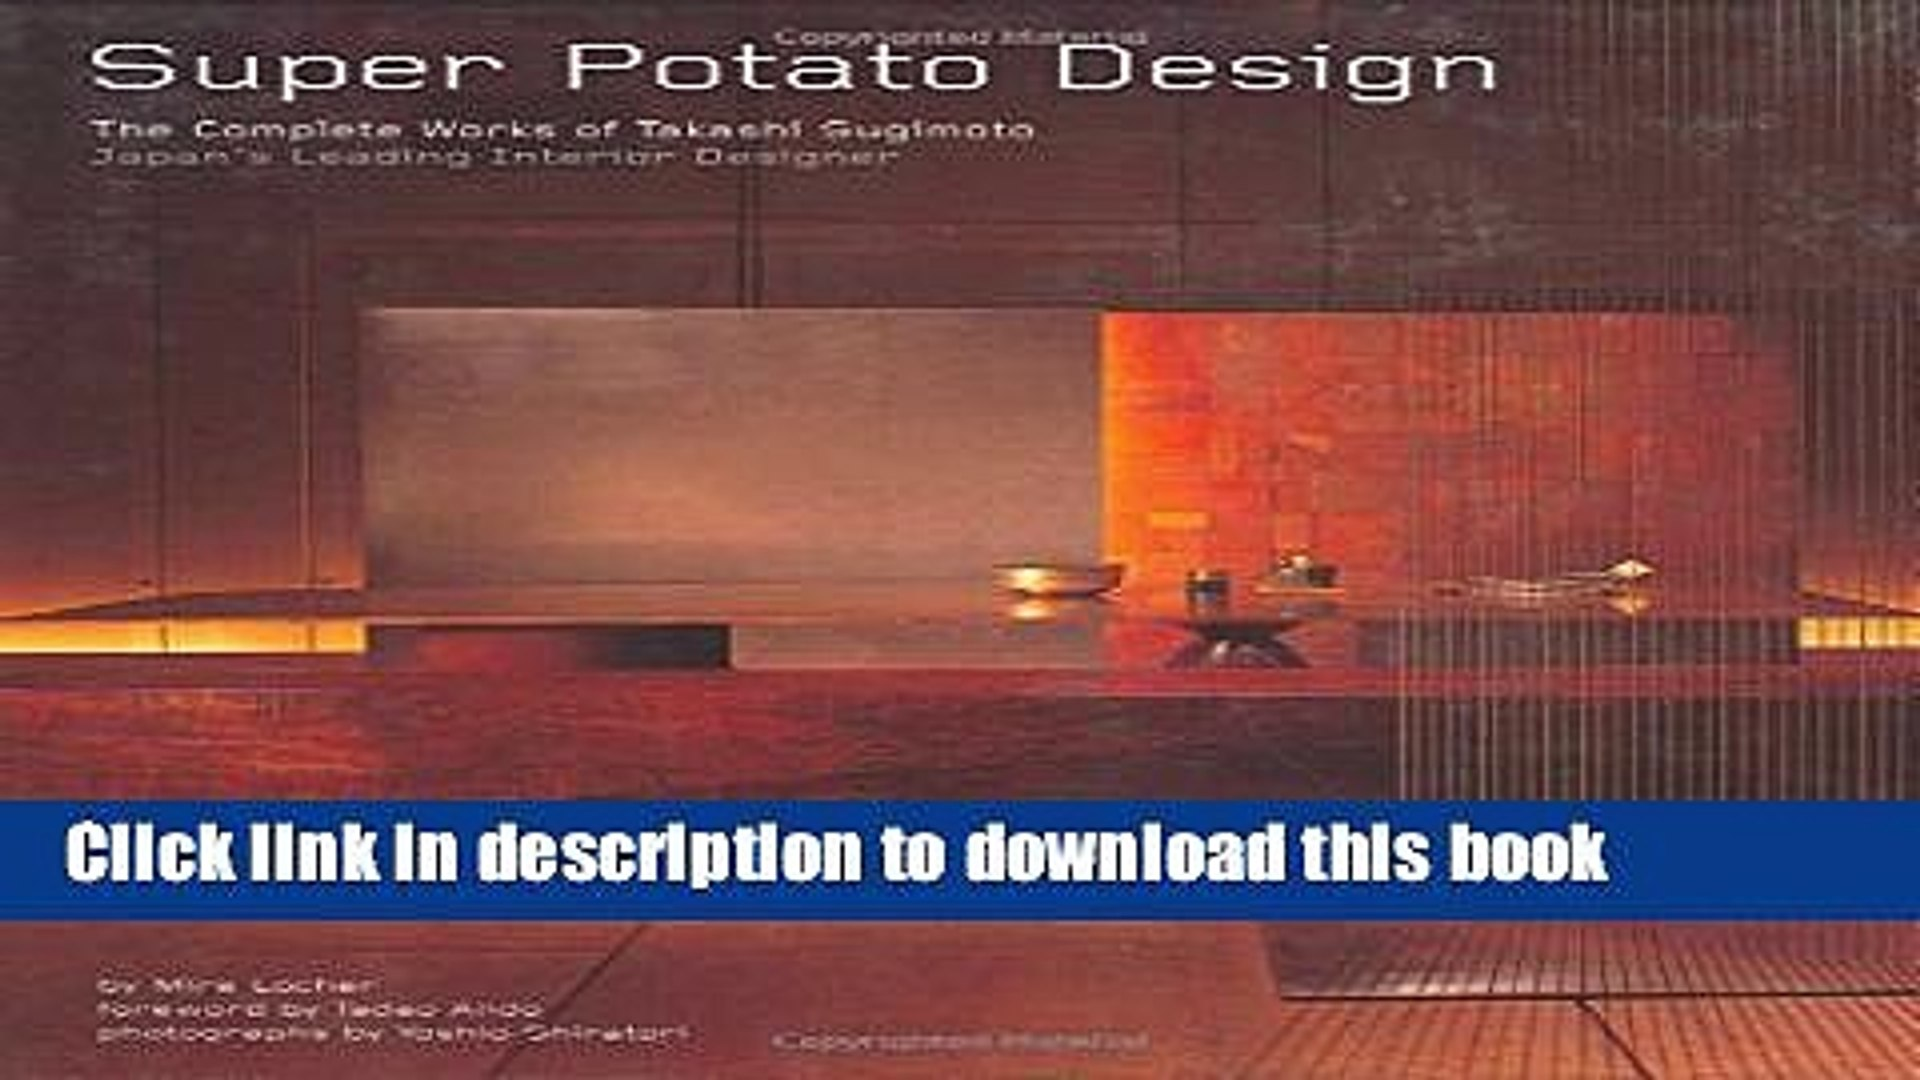 Read Super Potato Design The Complete Works Of Takashi Sugimoto Japan S Leading Interior